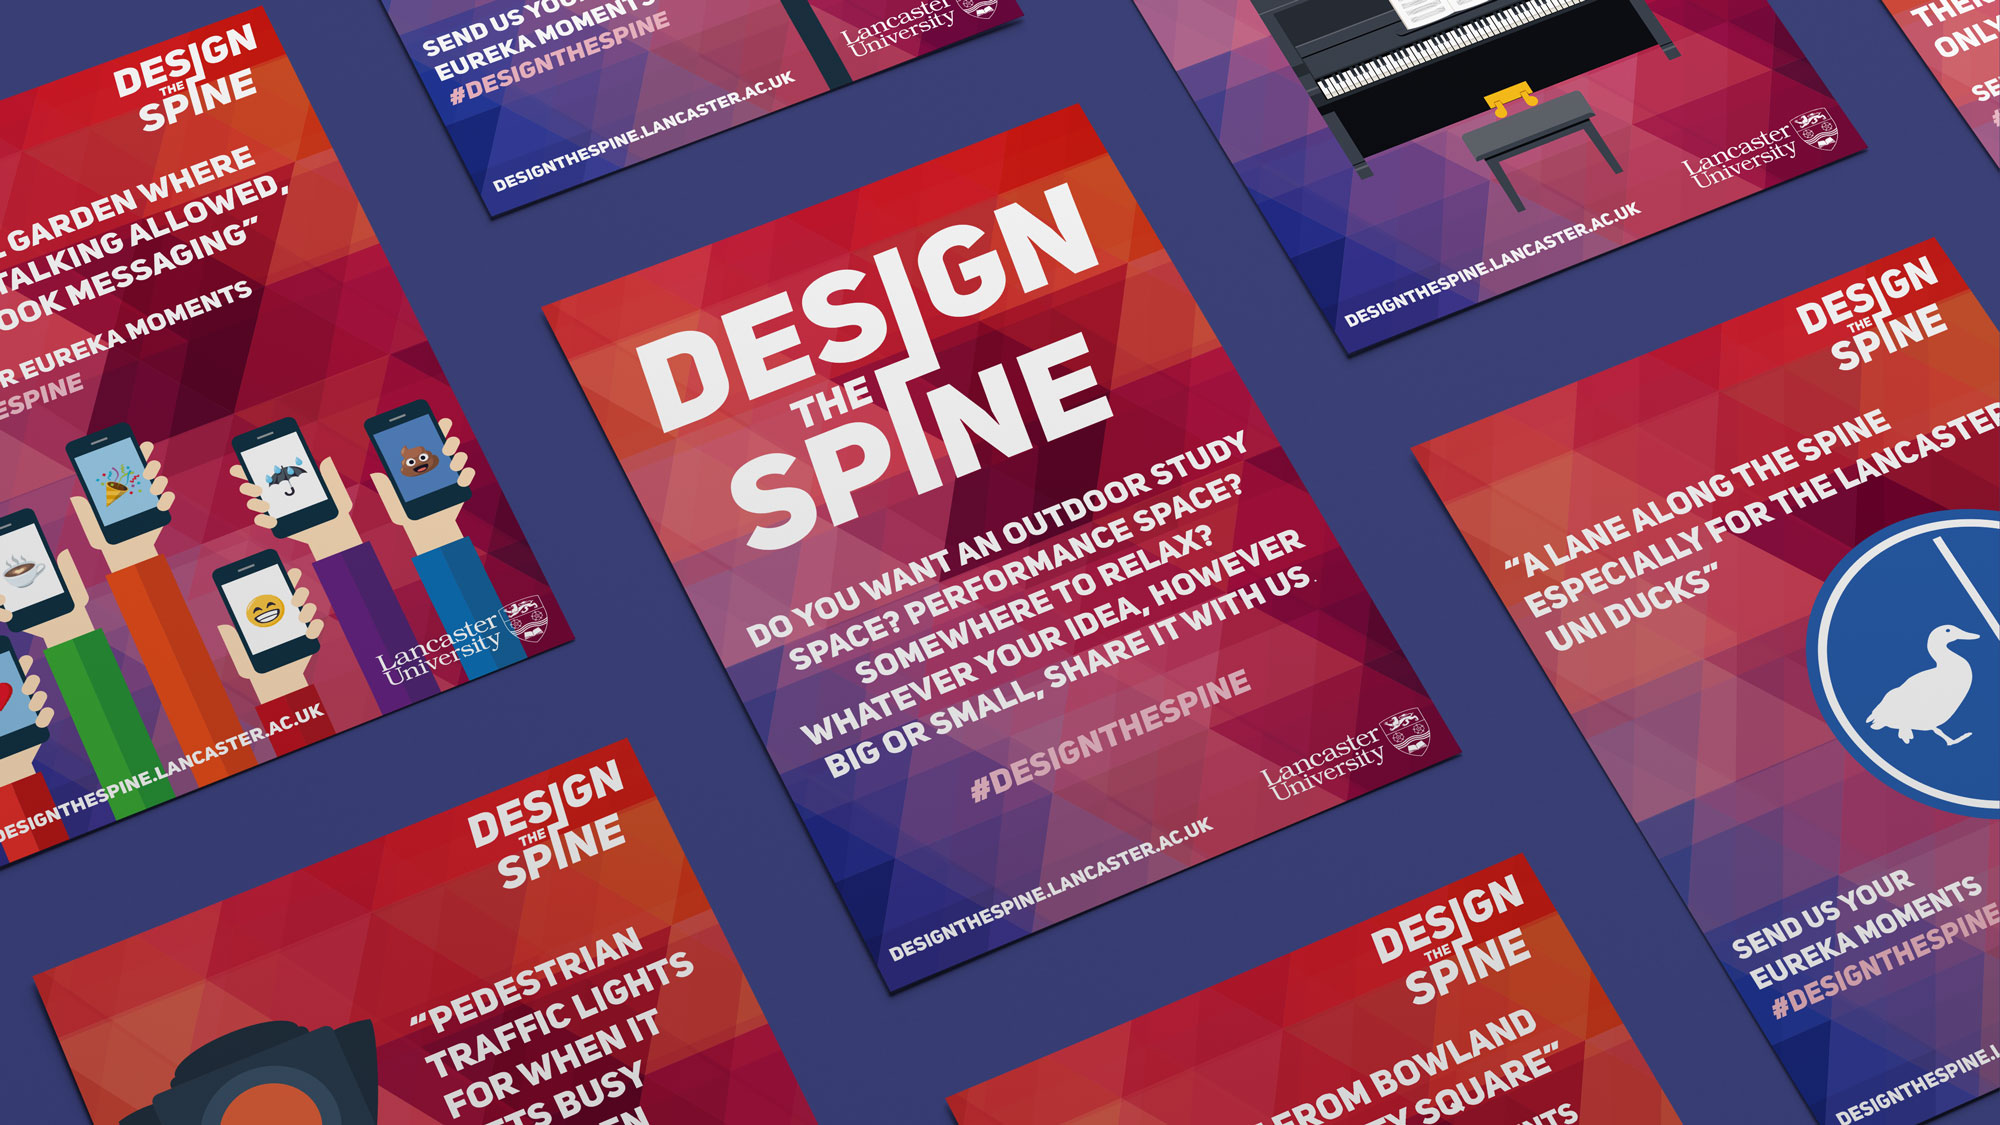 DESIGN THE SPINE  BRAND IDENTITY, PRINT & WEB DESIGN